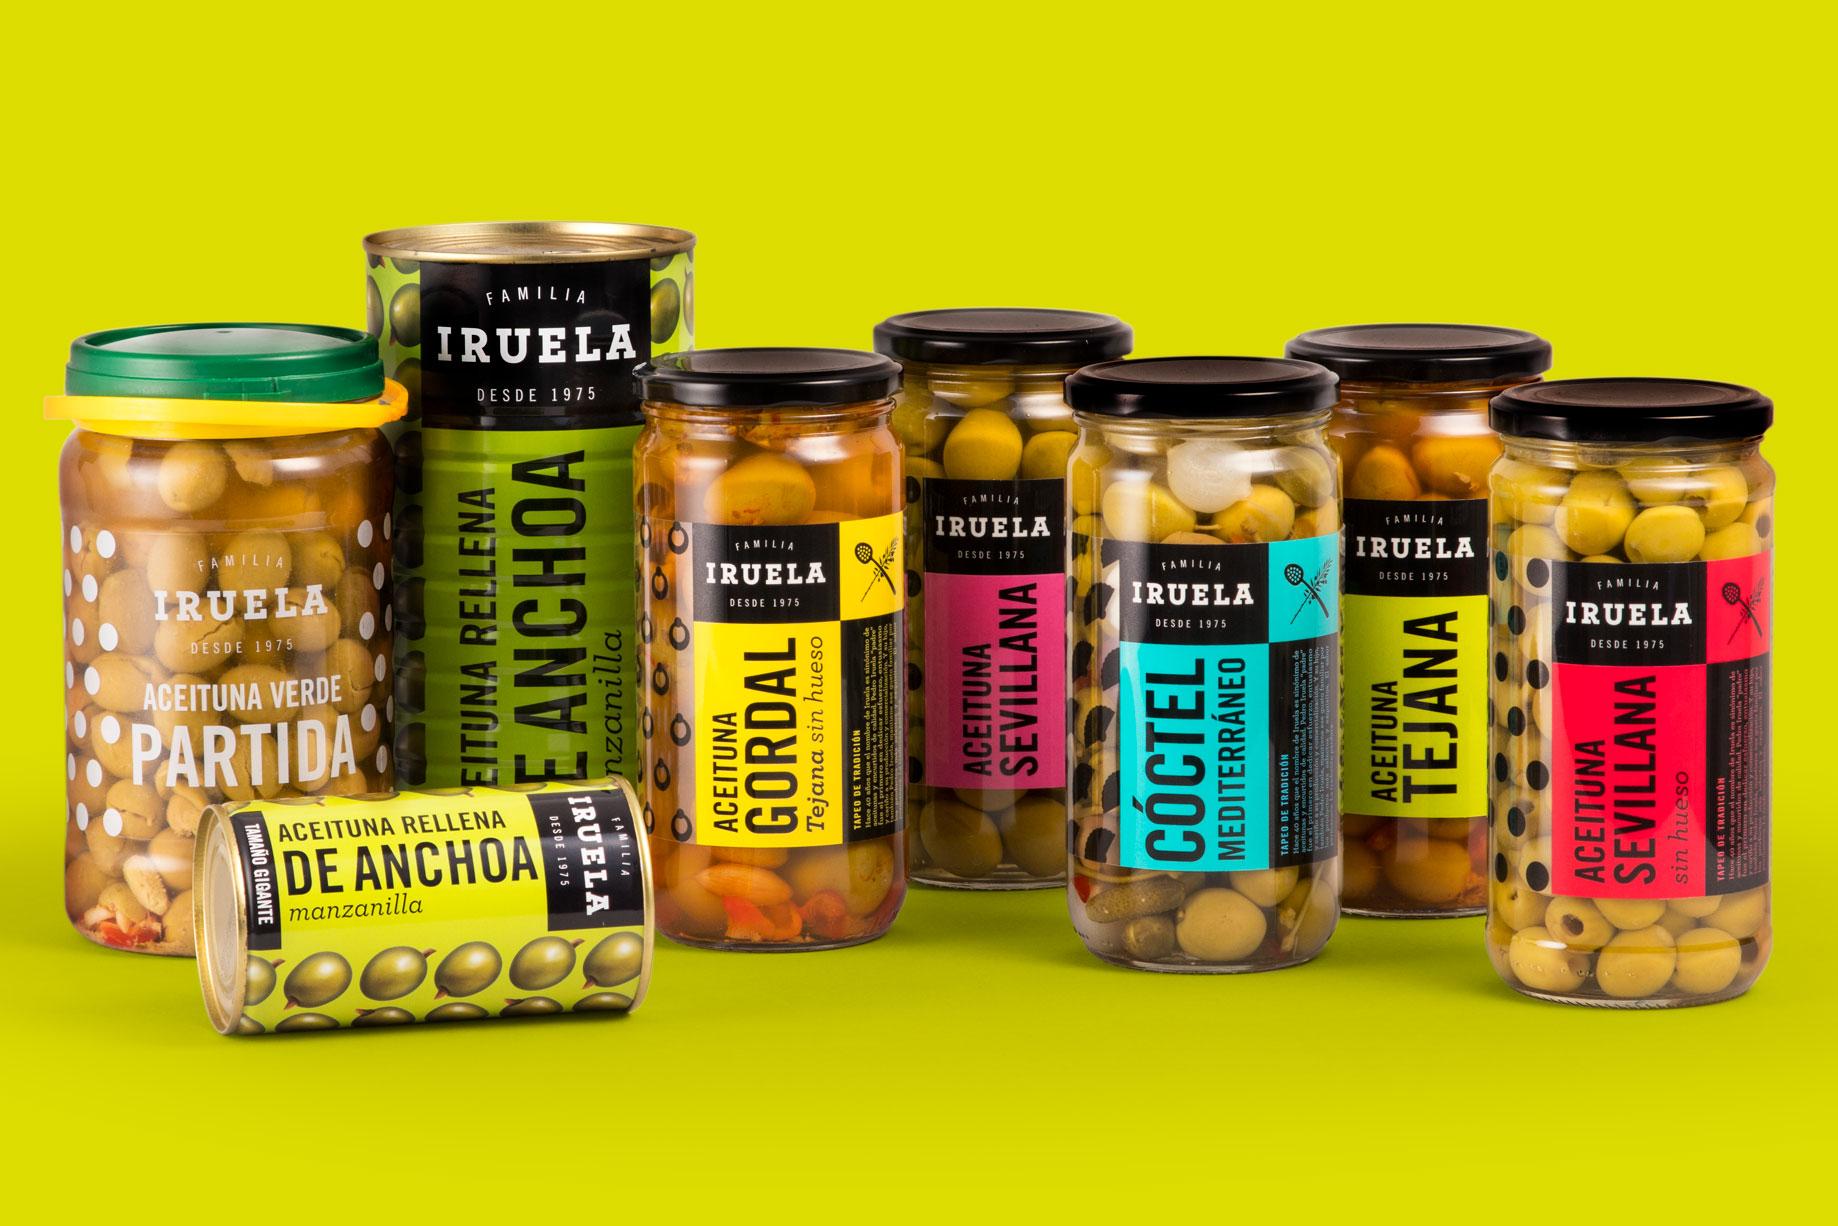 Iruela branding identitat corporativa packaging etiquetes disseny gràfic Vibranding